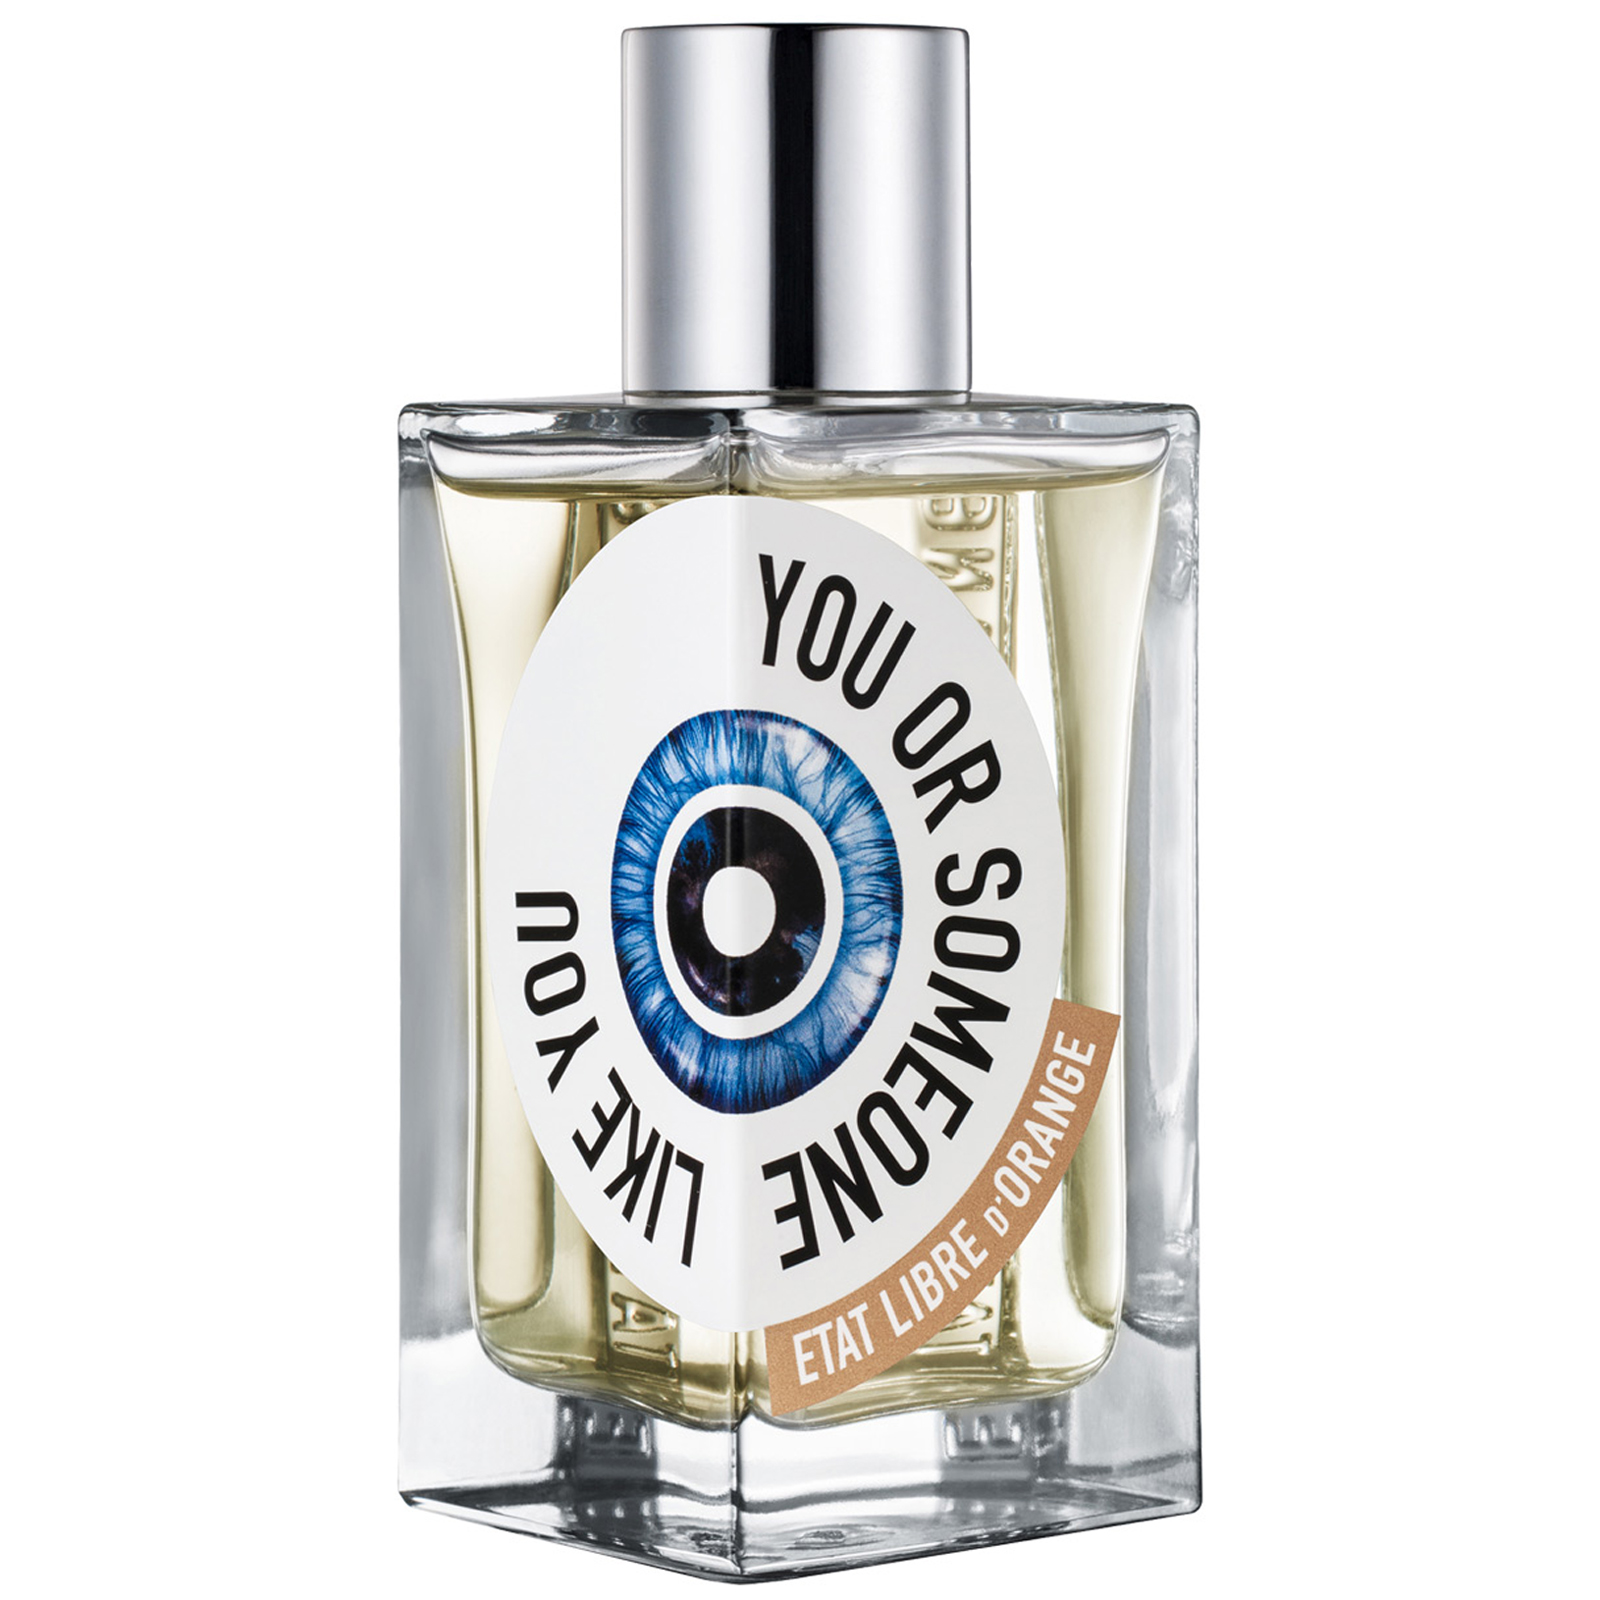 ETAT LIBRE D'ORANGE You Or Someone Like You Perfume Eau De Parfum 50 Ml in White